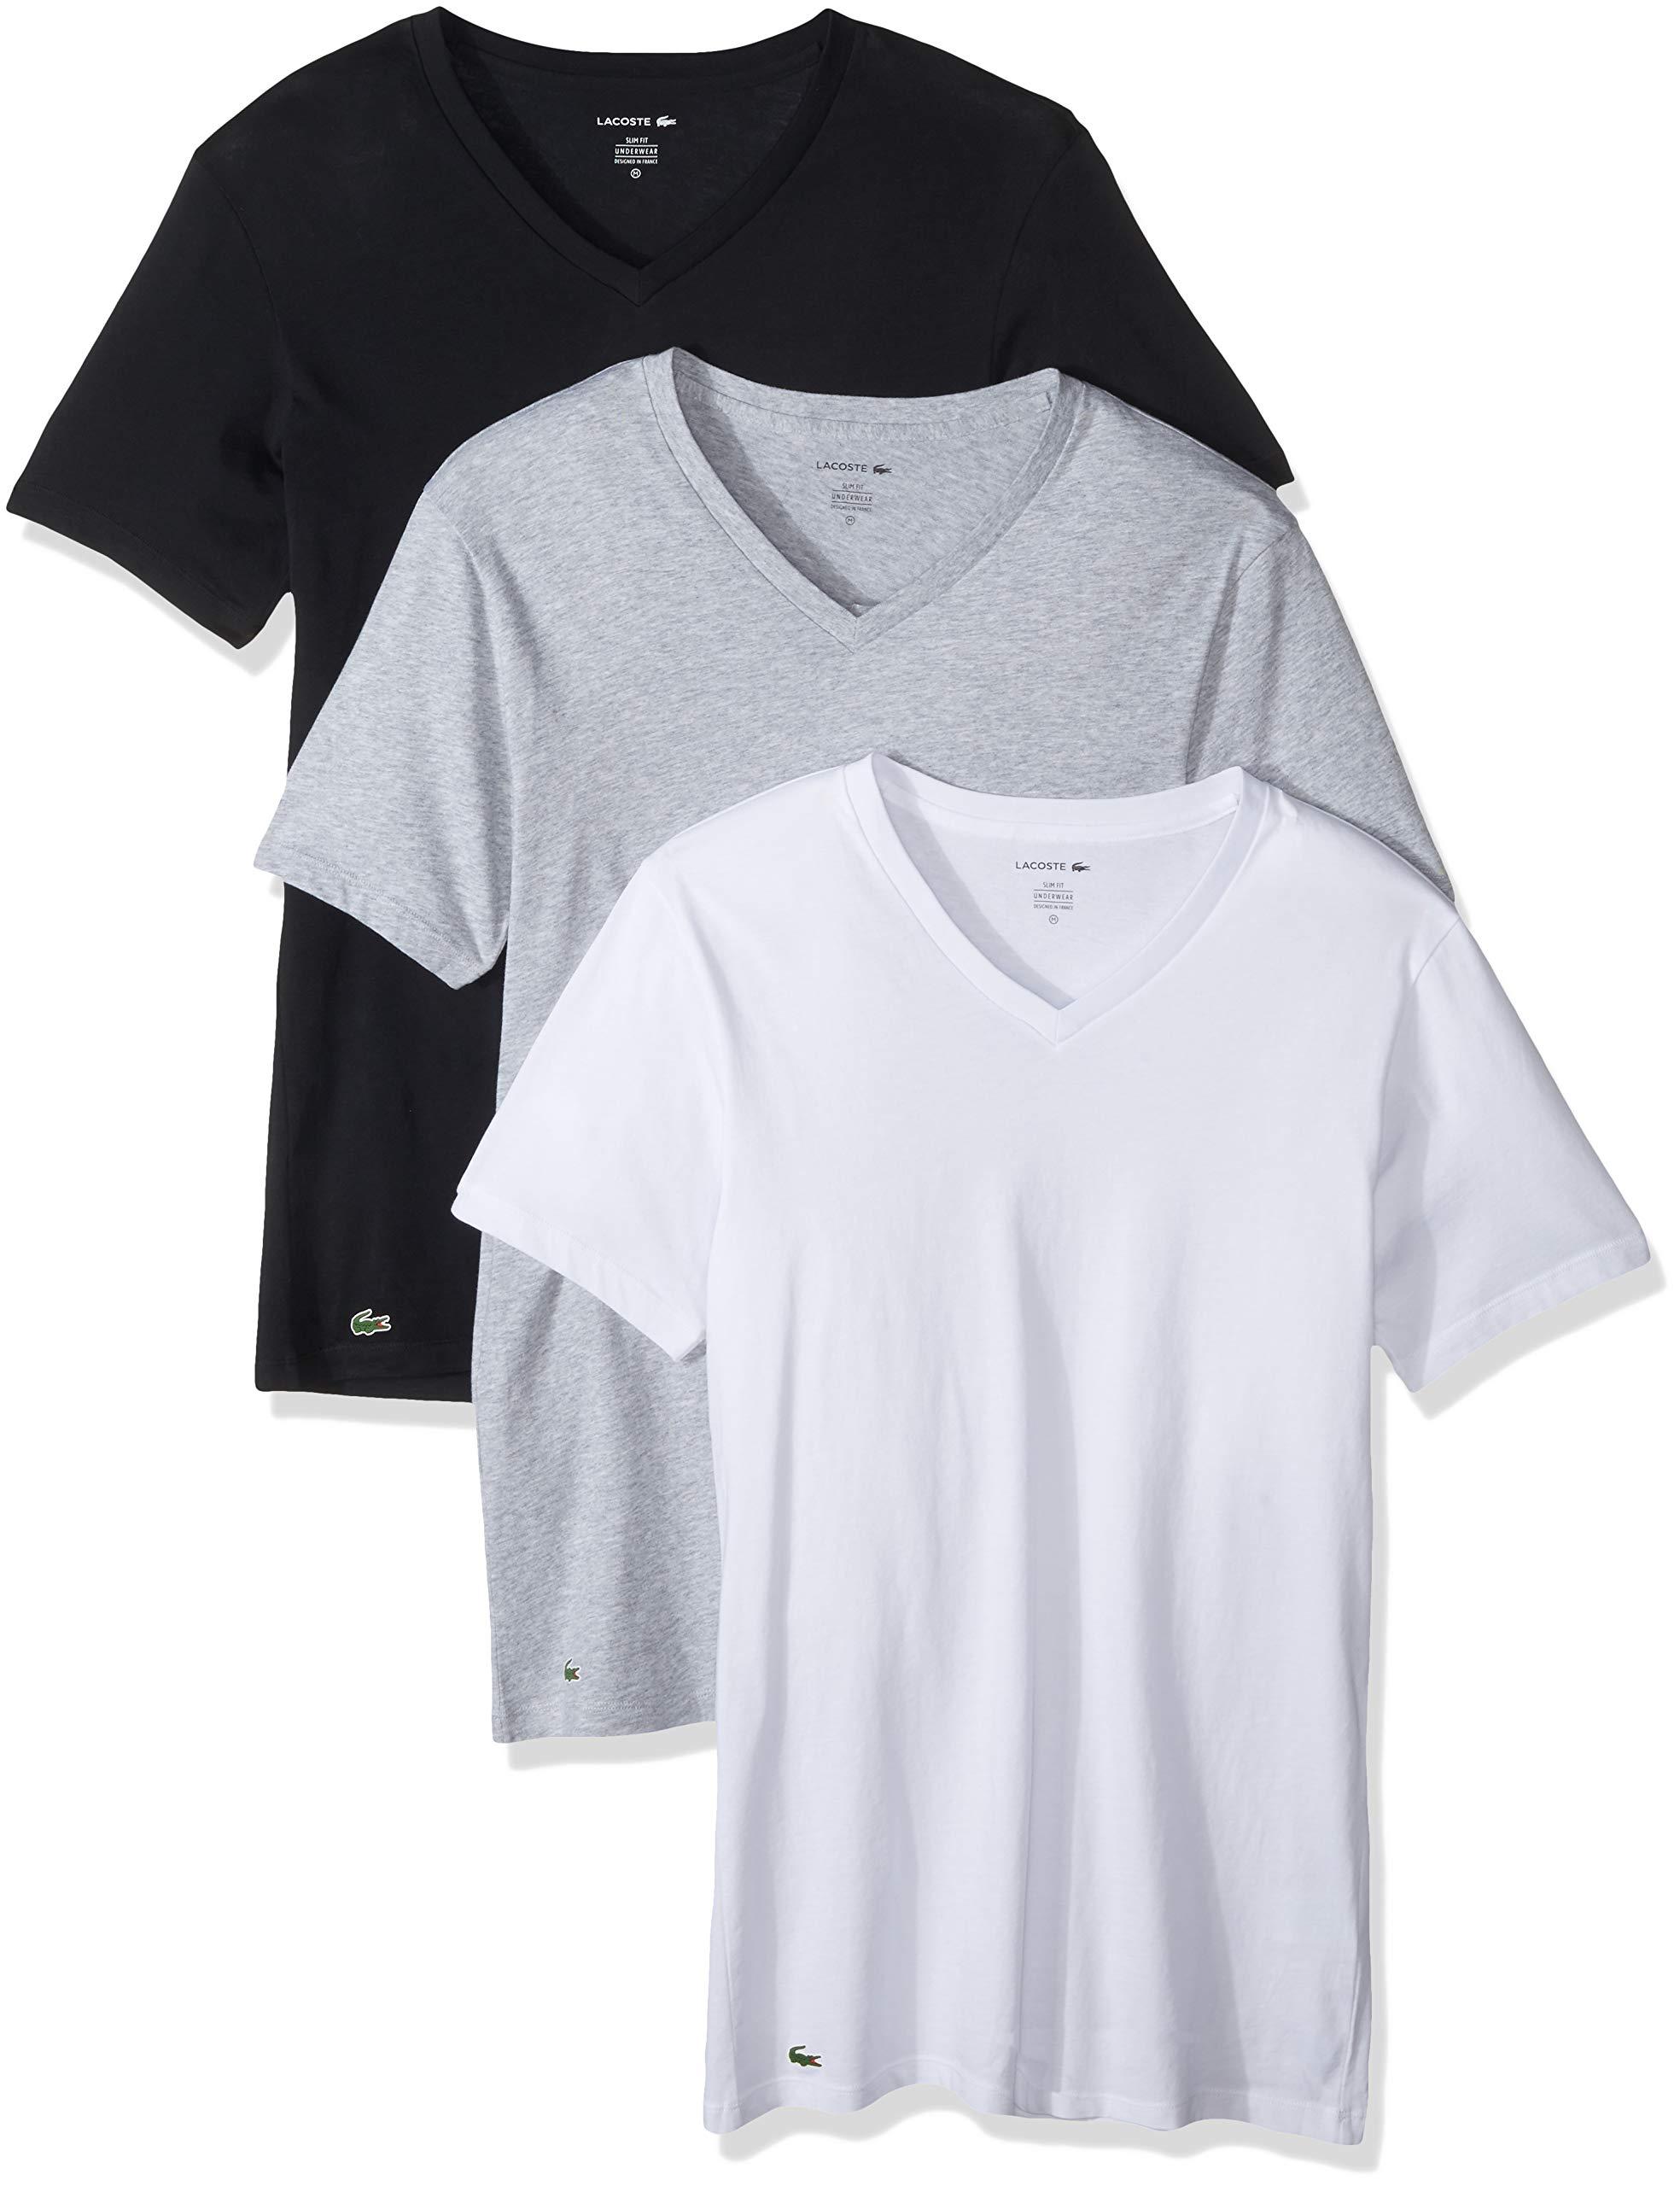 Lacoste Men's 3 Pack Slim V Neck Tee, Black/Grey/White, M by Lacoste